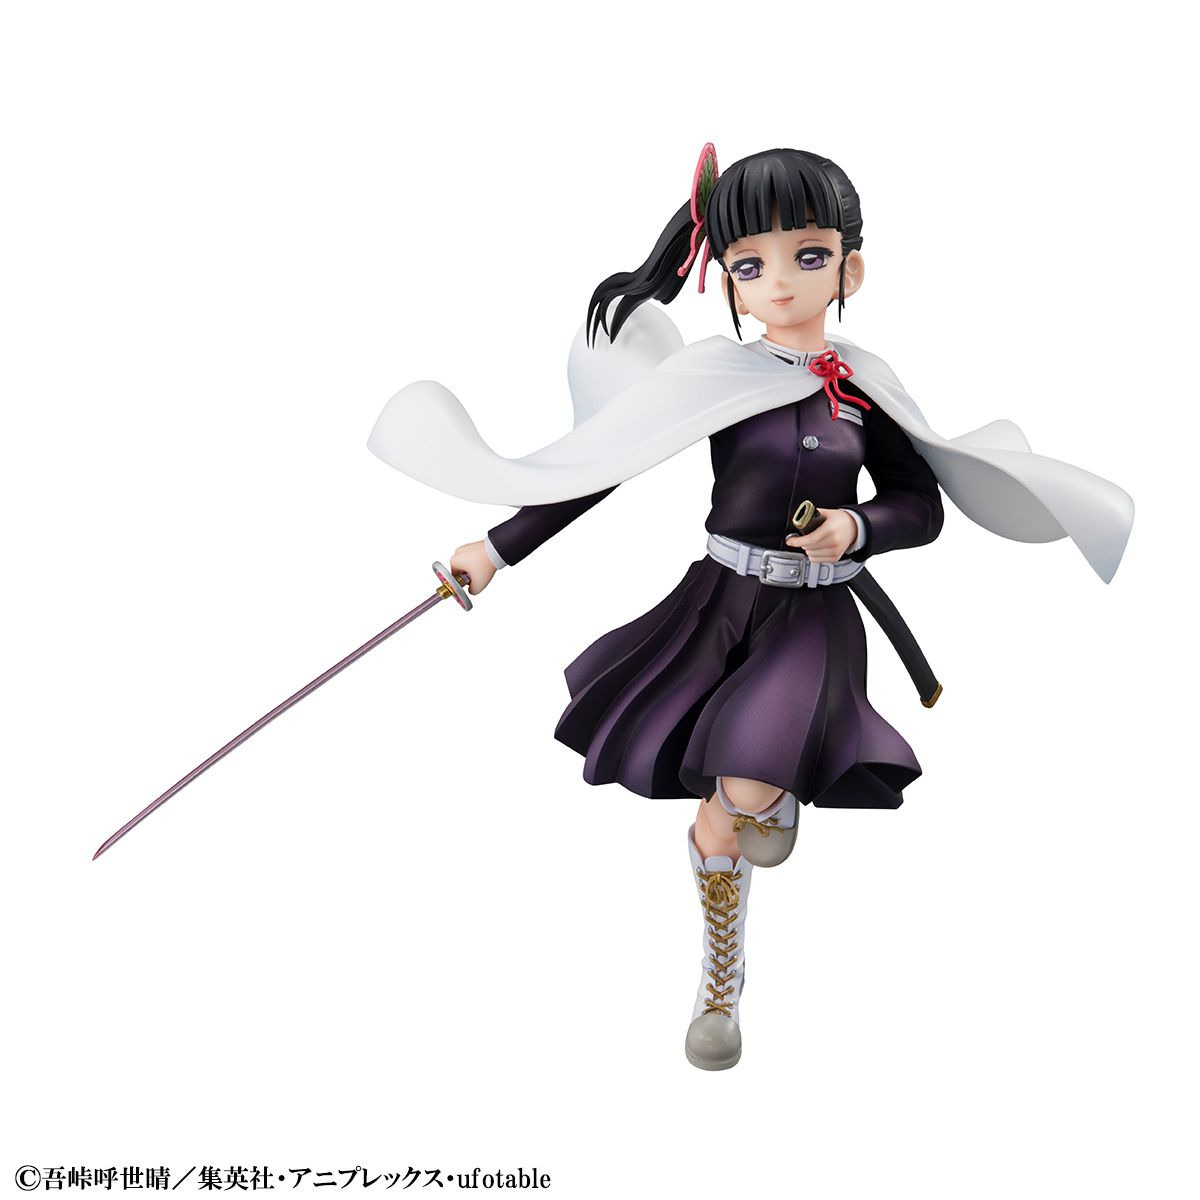 Kanao_3 - Figura semanal - (3-16-5-2021) - Hanami Dango